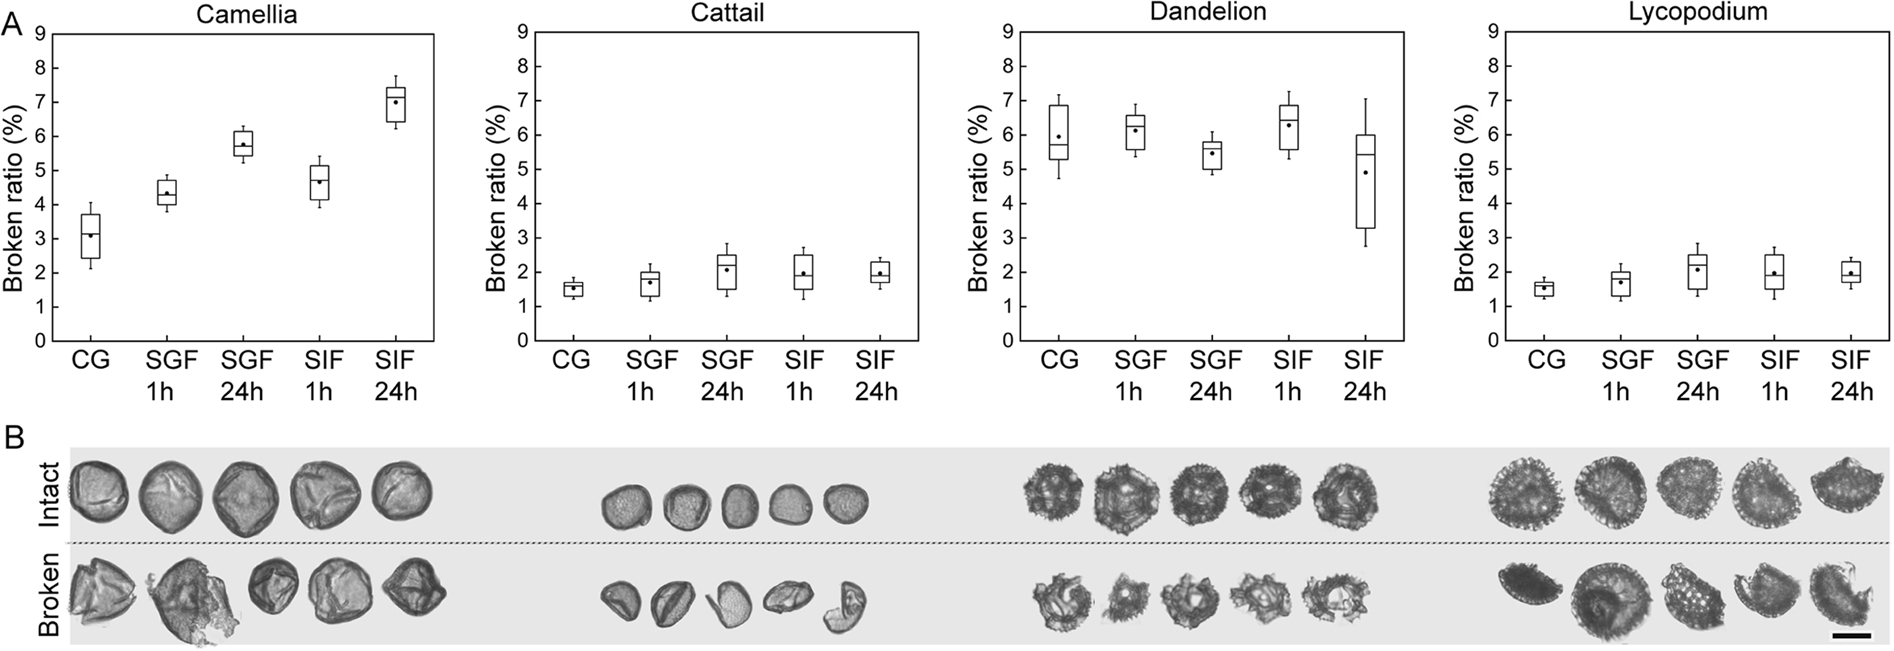 Species-Specific Biodegradation of Sporopollenin-Based